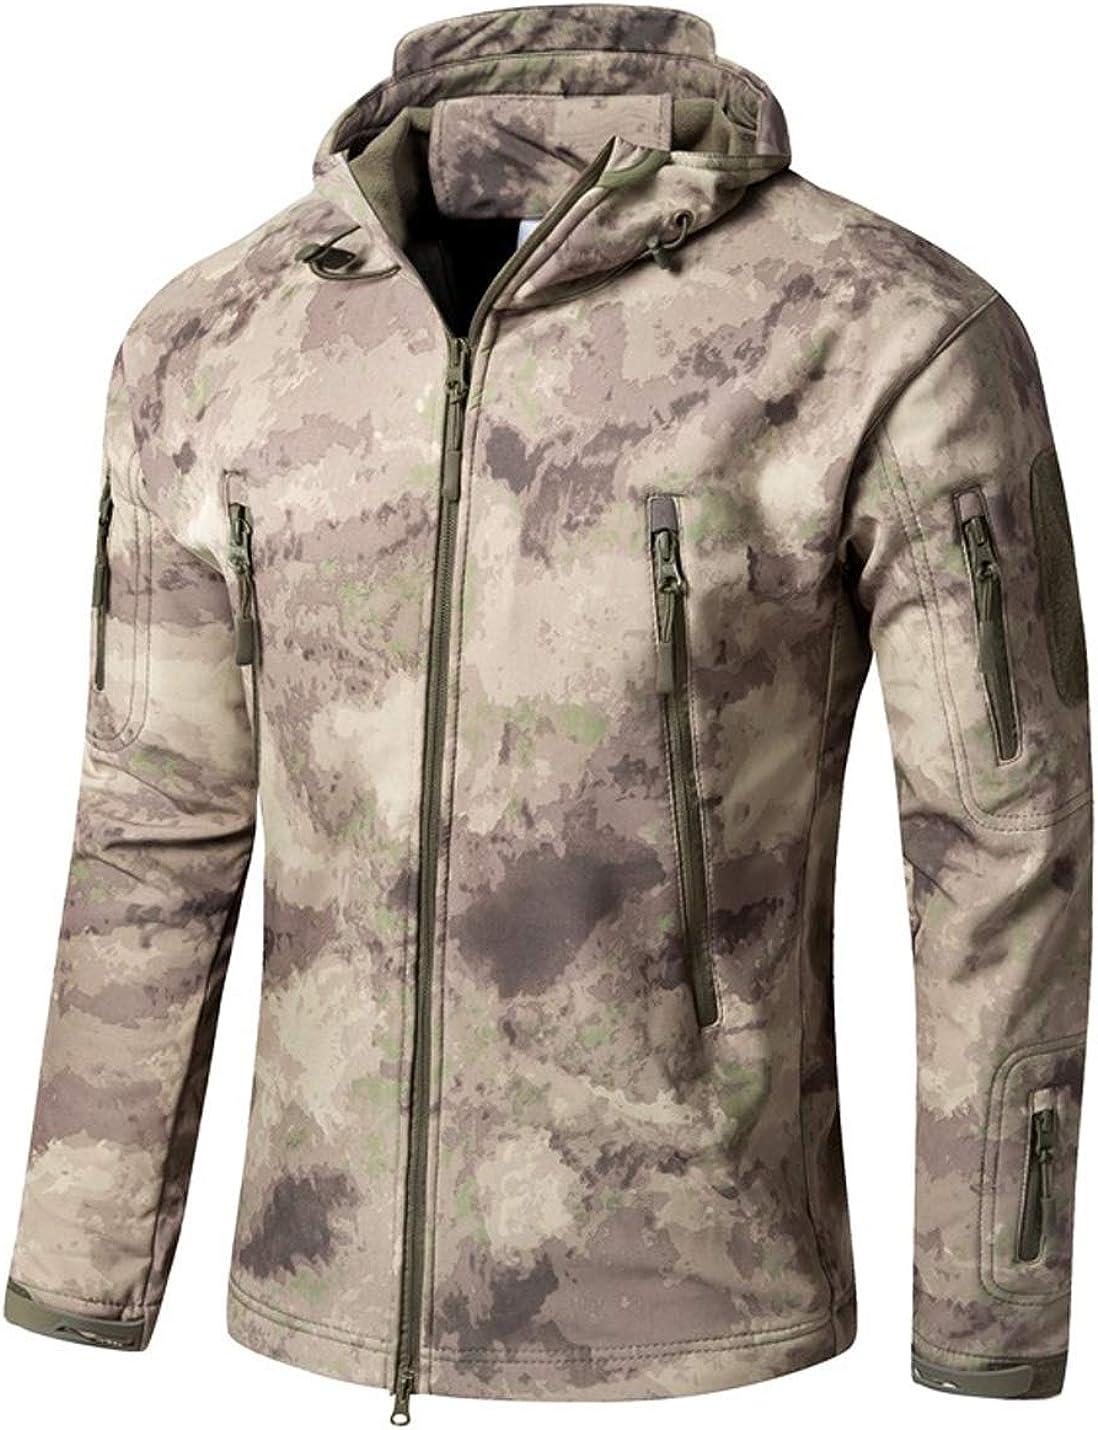 Gihuo Men's Outdoor Tactical Camo Hooded Softshell Fleece Jacket